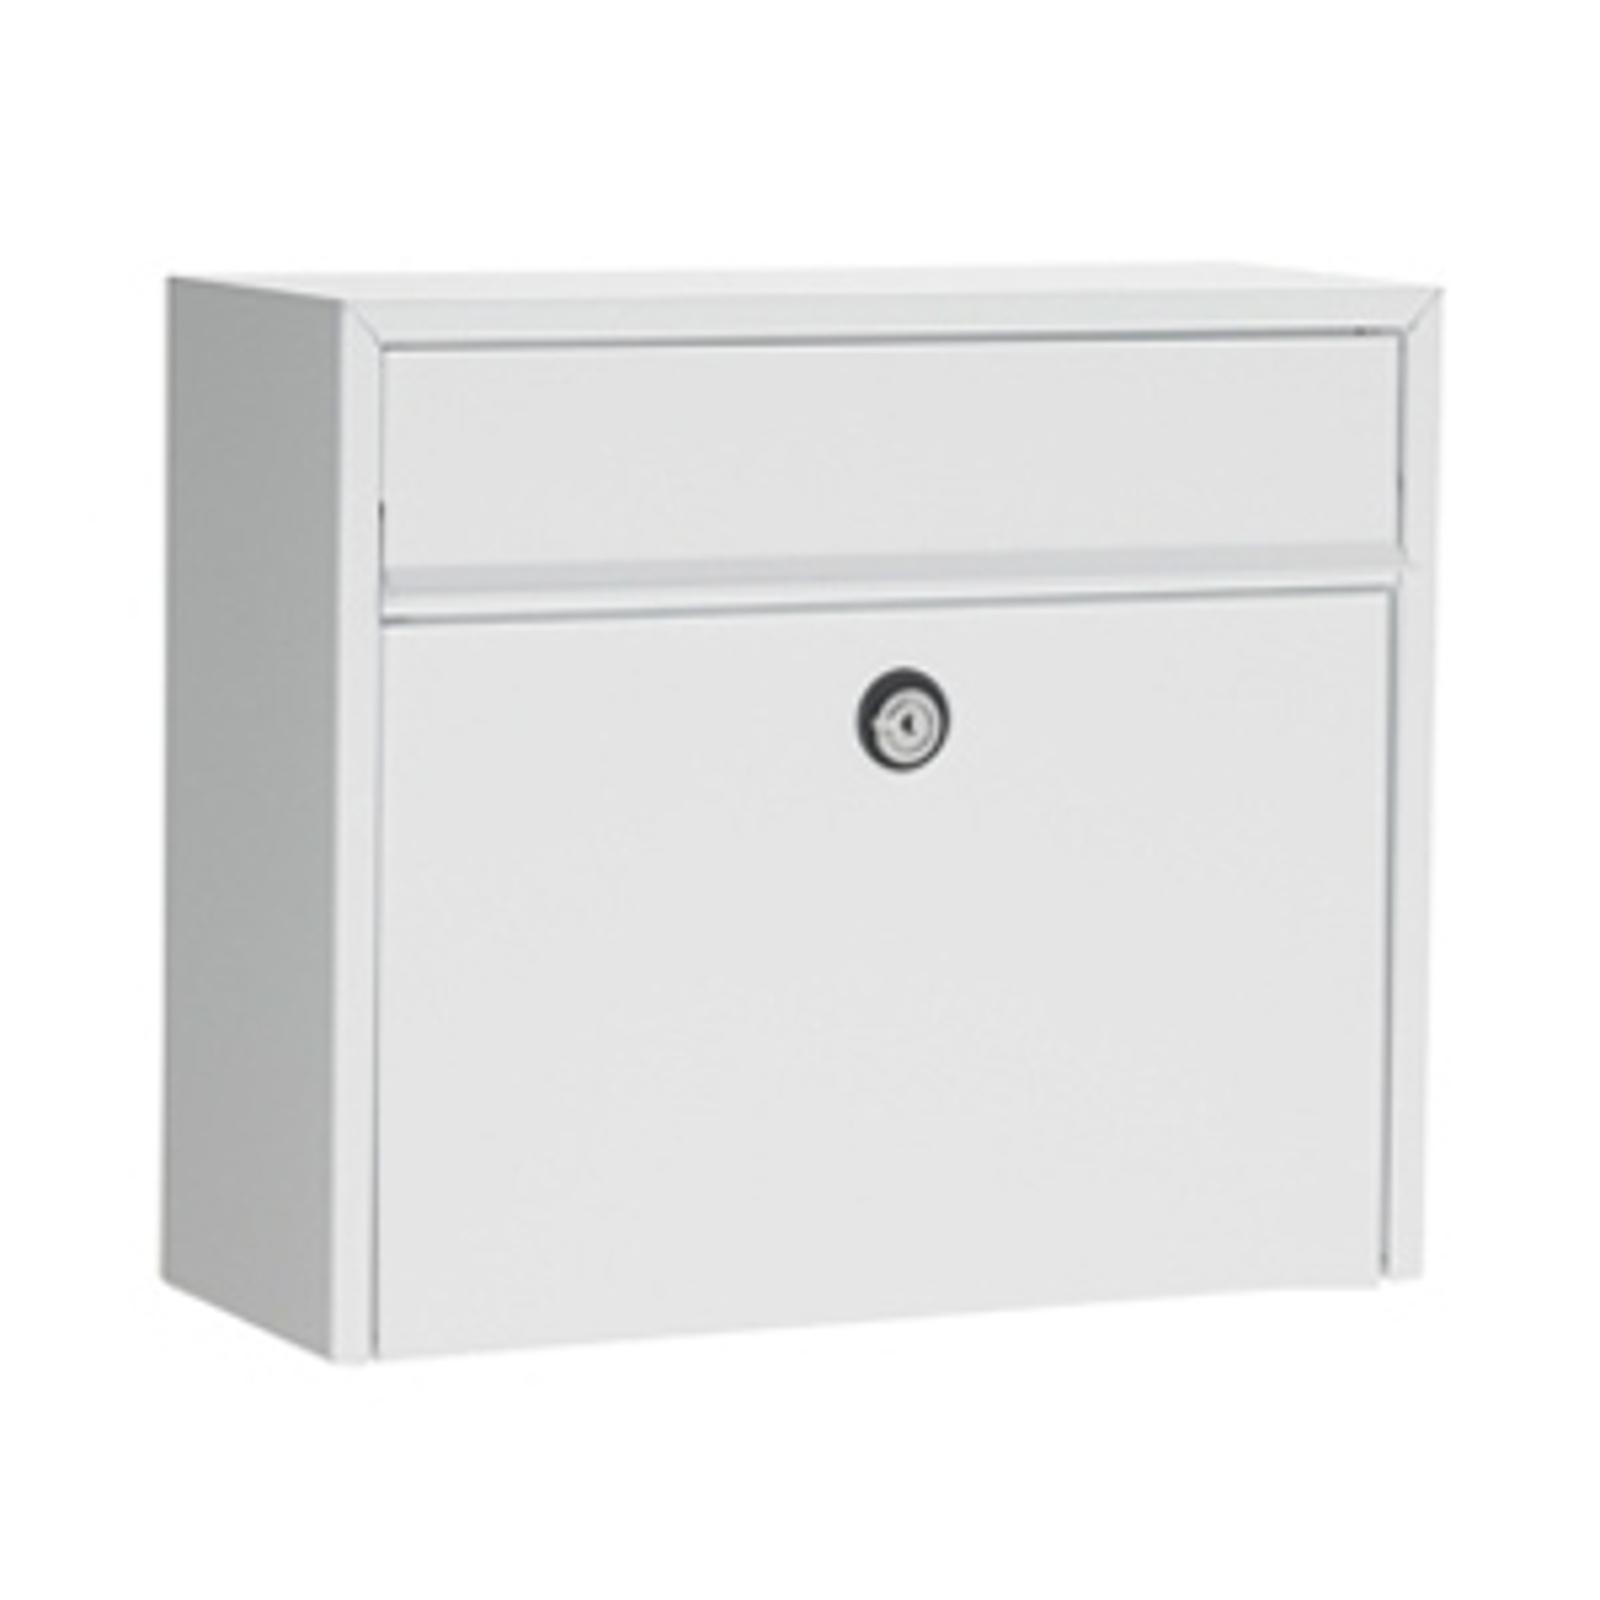 Simple letterbox LT150_1045037_1